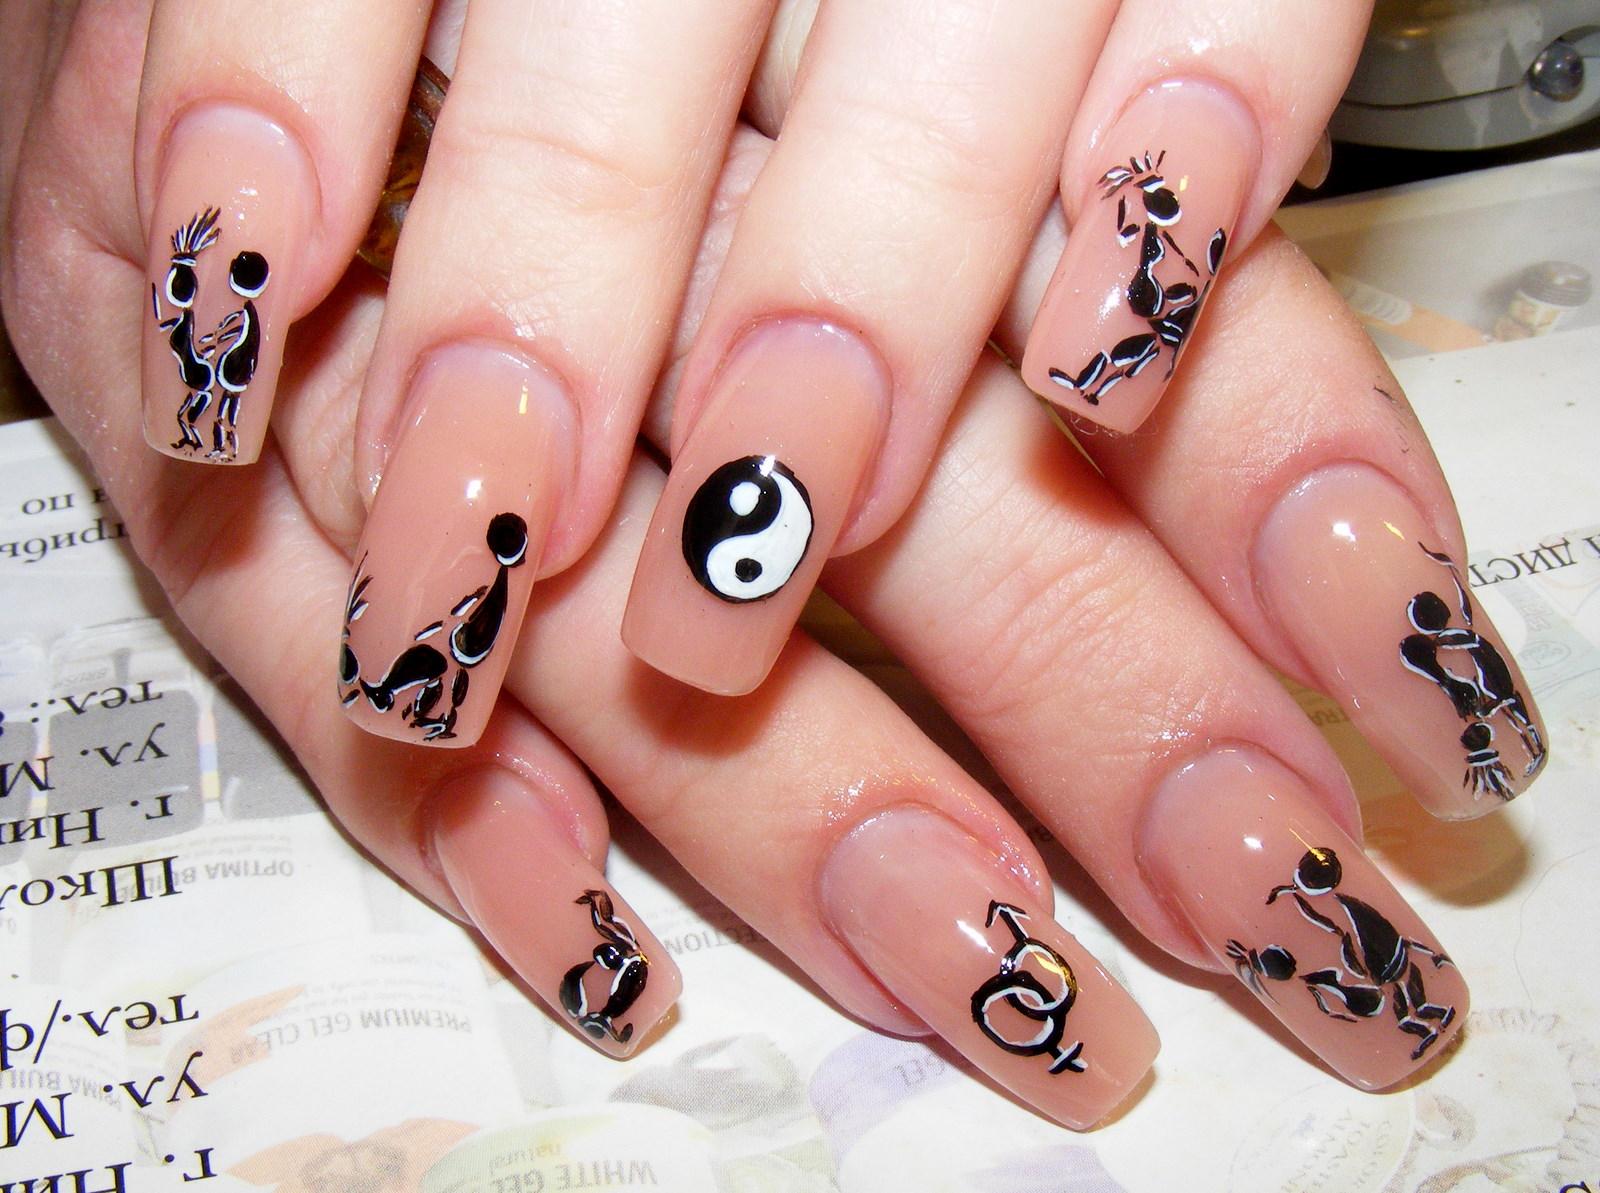 Рисунки на ногтях в домашних условиях 10 фотография